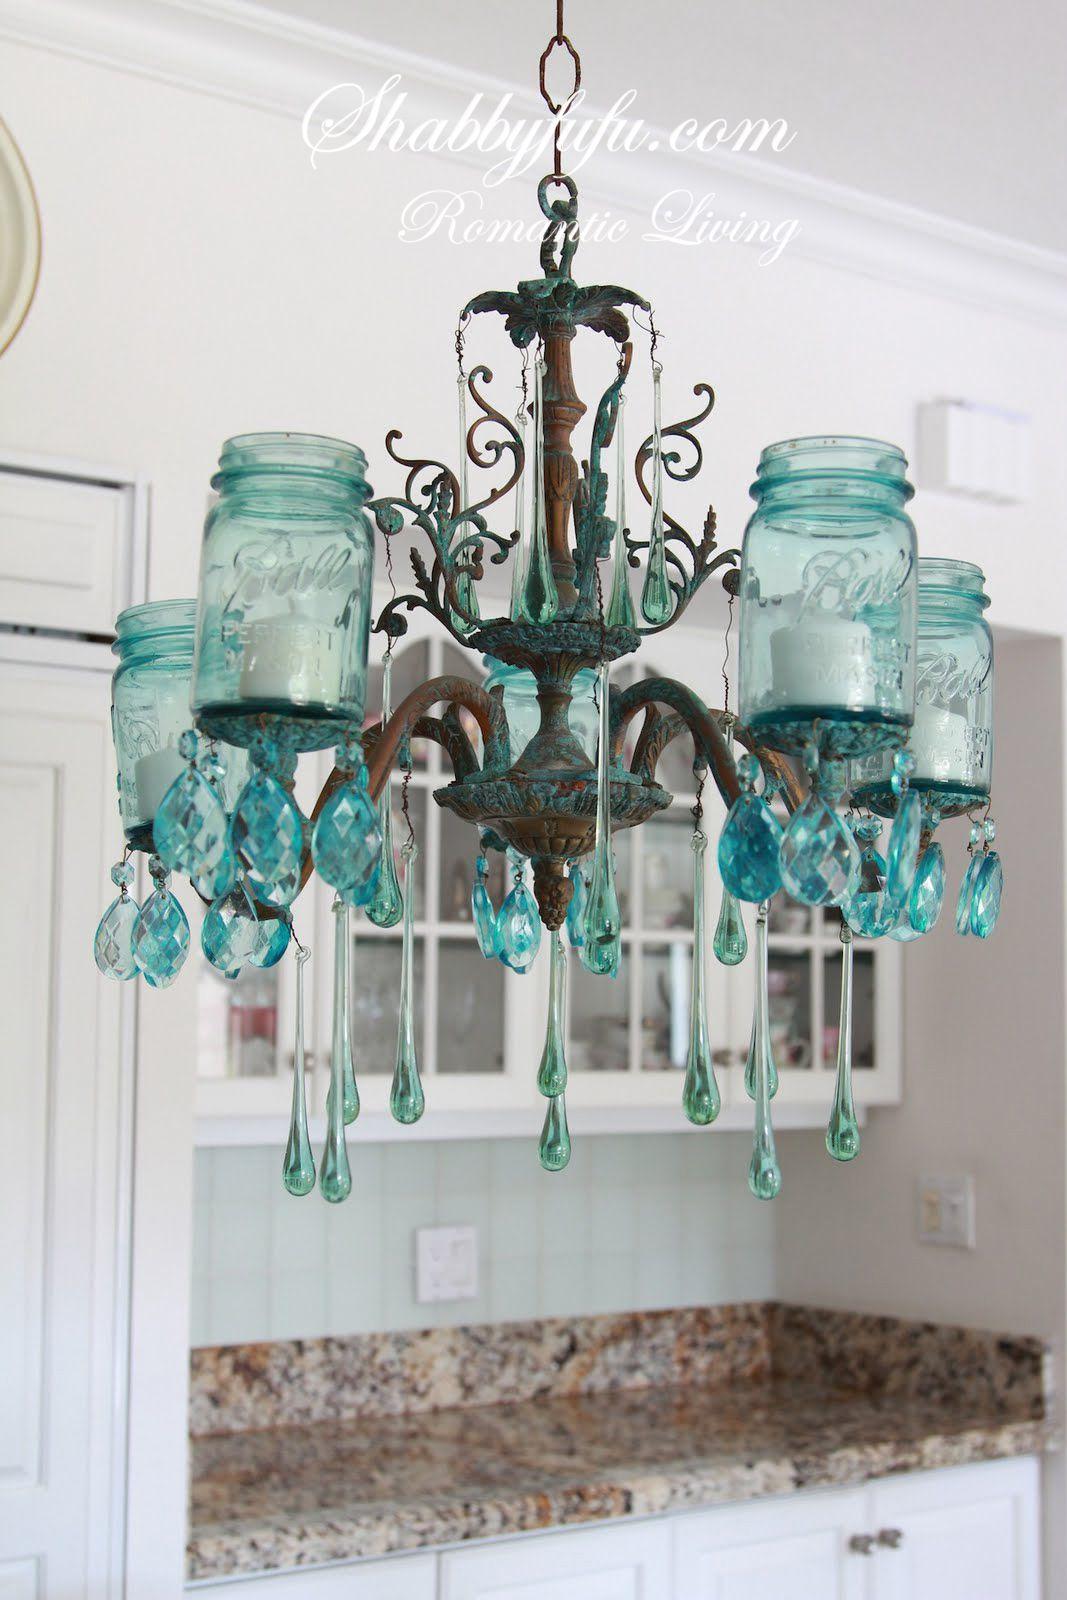 The Original Shabbyfufu Blue Mason Jar Chandelier | Mason jar ...